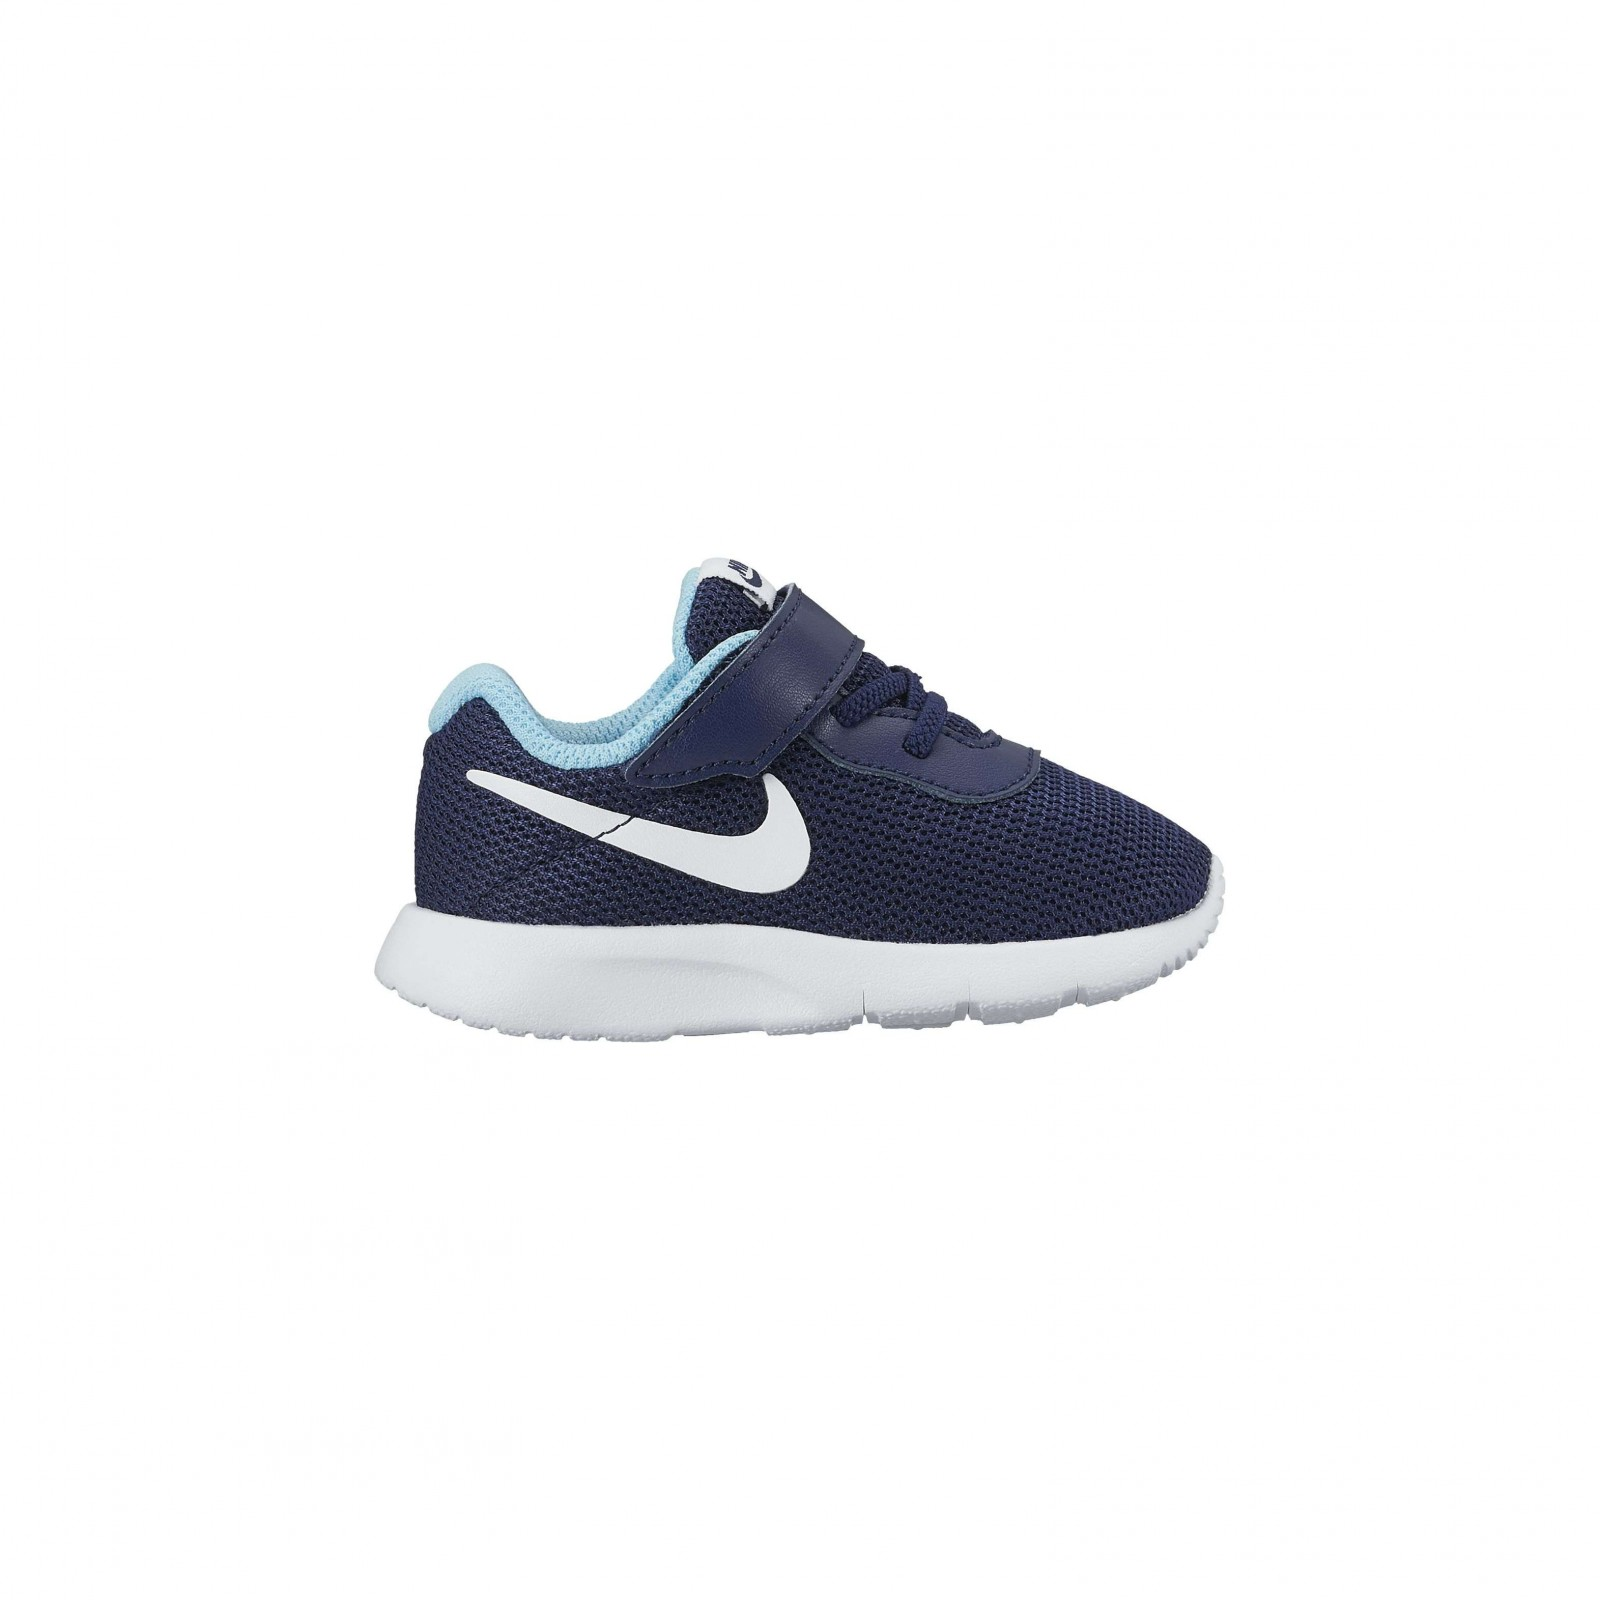 Dětské Tenisky Nike TANJUN (TDV)  97398b218a